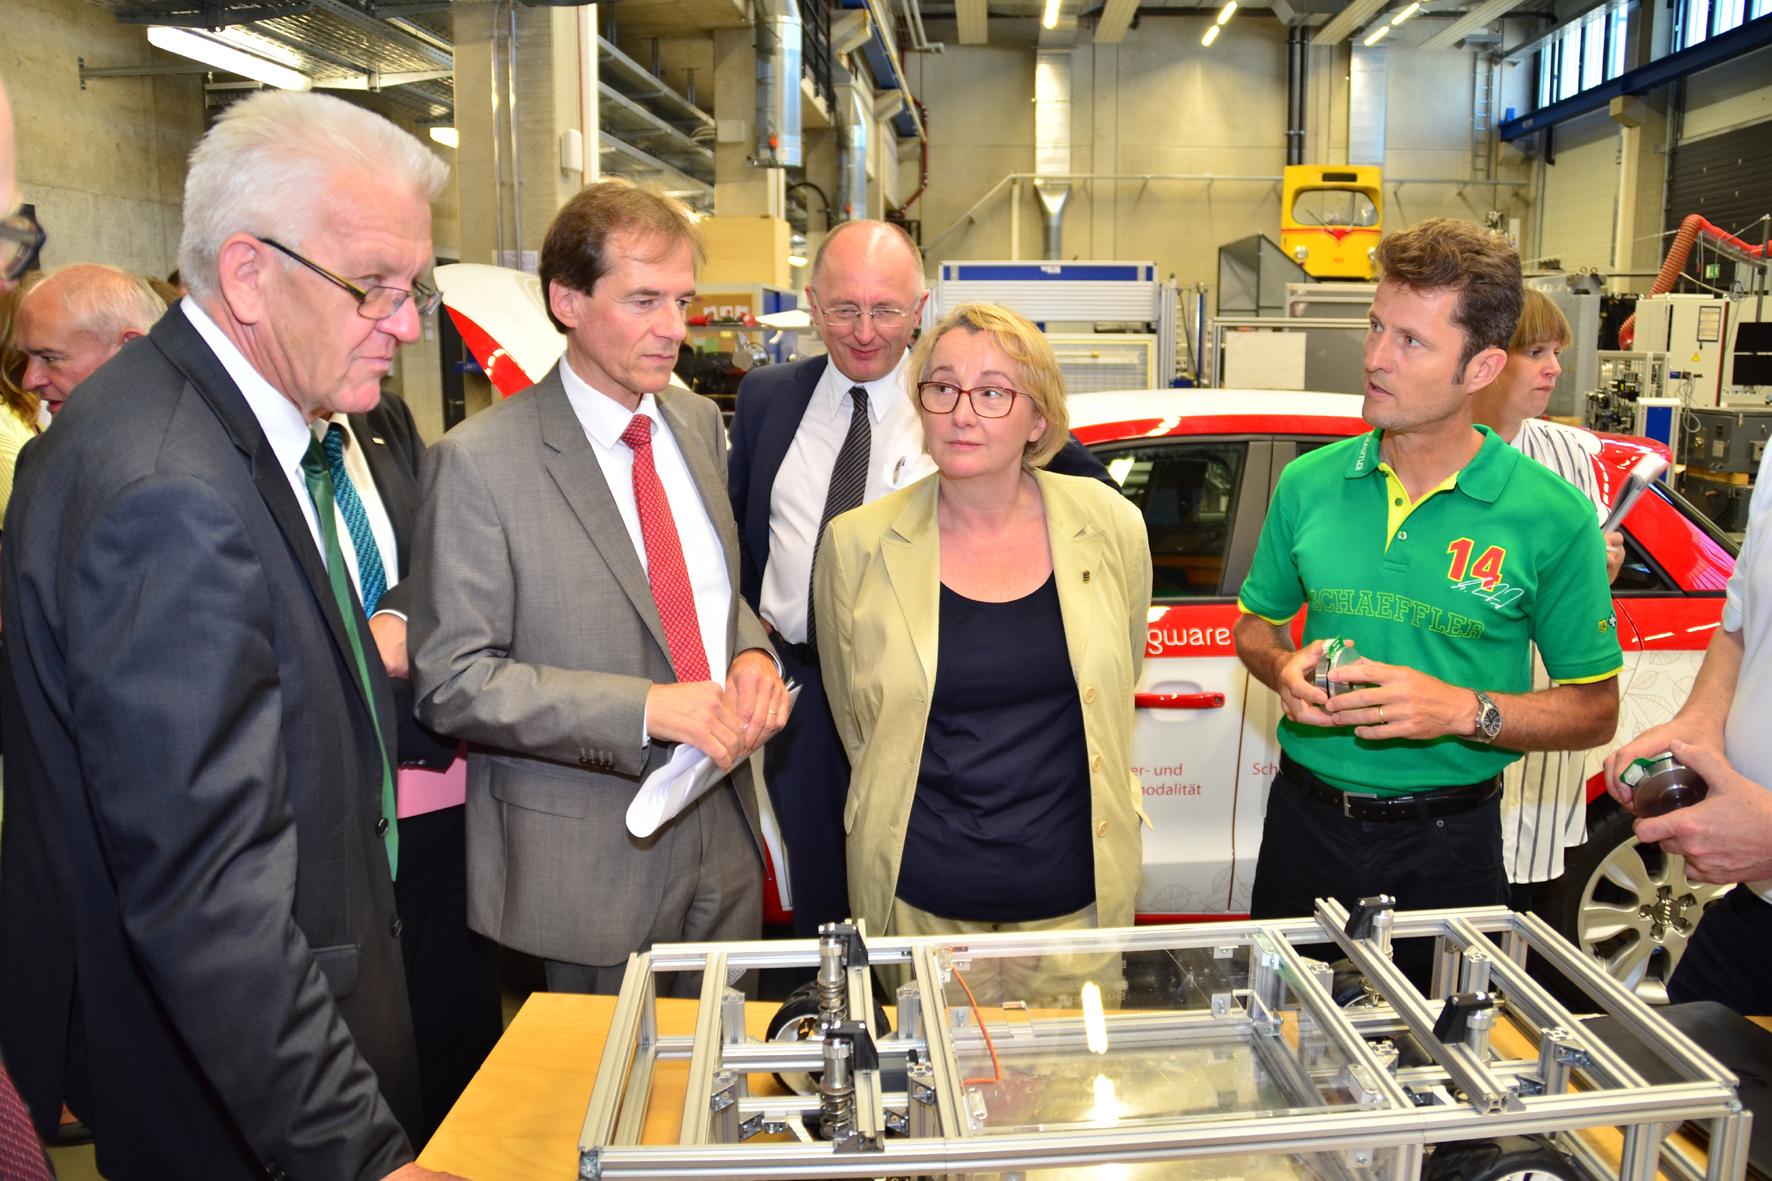 "mid Düsseldorf - Baden-Württembergs Ministerpräsident Winfried Kretschmann (links) informierte sich am KIT unter anderem über das Projekt ""e²-Lenk"", eine neuartige Lenkkraftunterstützung für Elektrofahrzeuge."